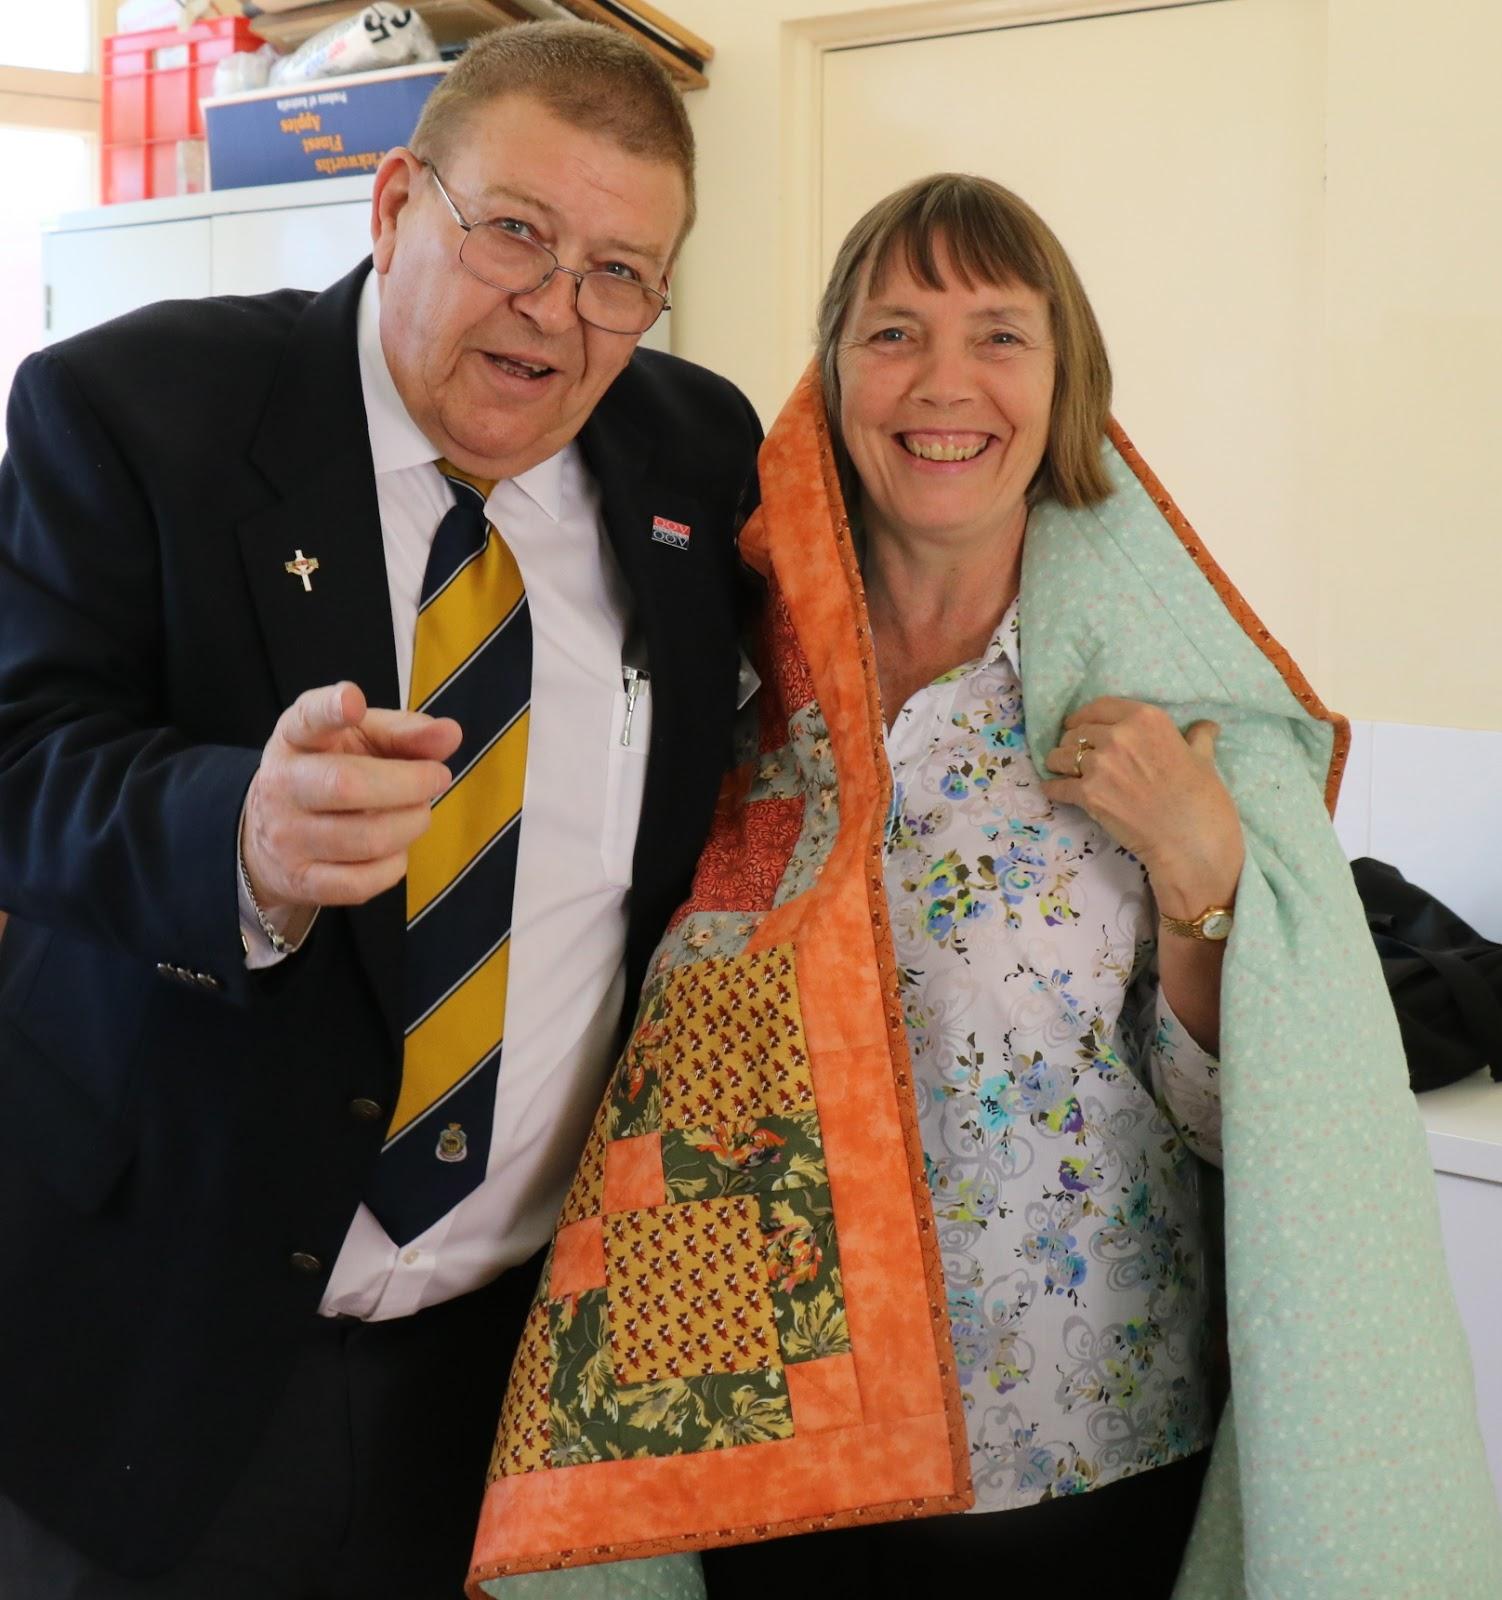 Fairholme Quilters: Quilts of Valour Australia visit and quilt ... : quilts of valour australia - Adamdwight.com